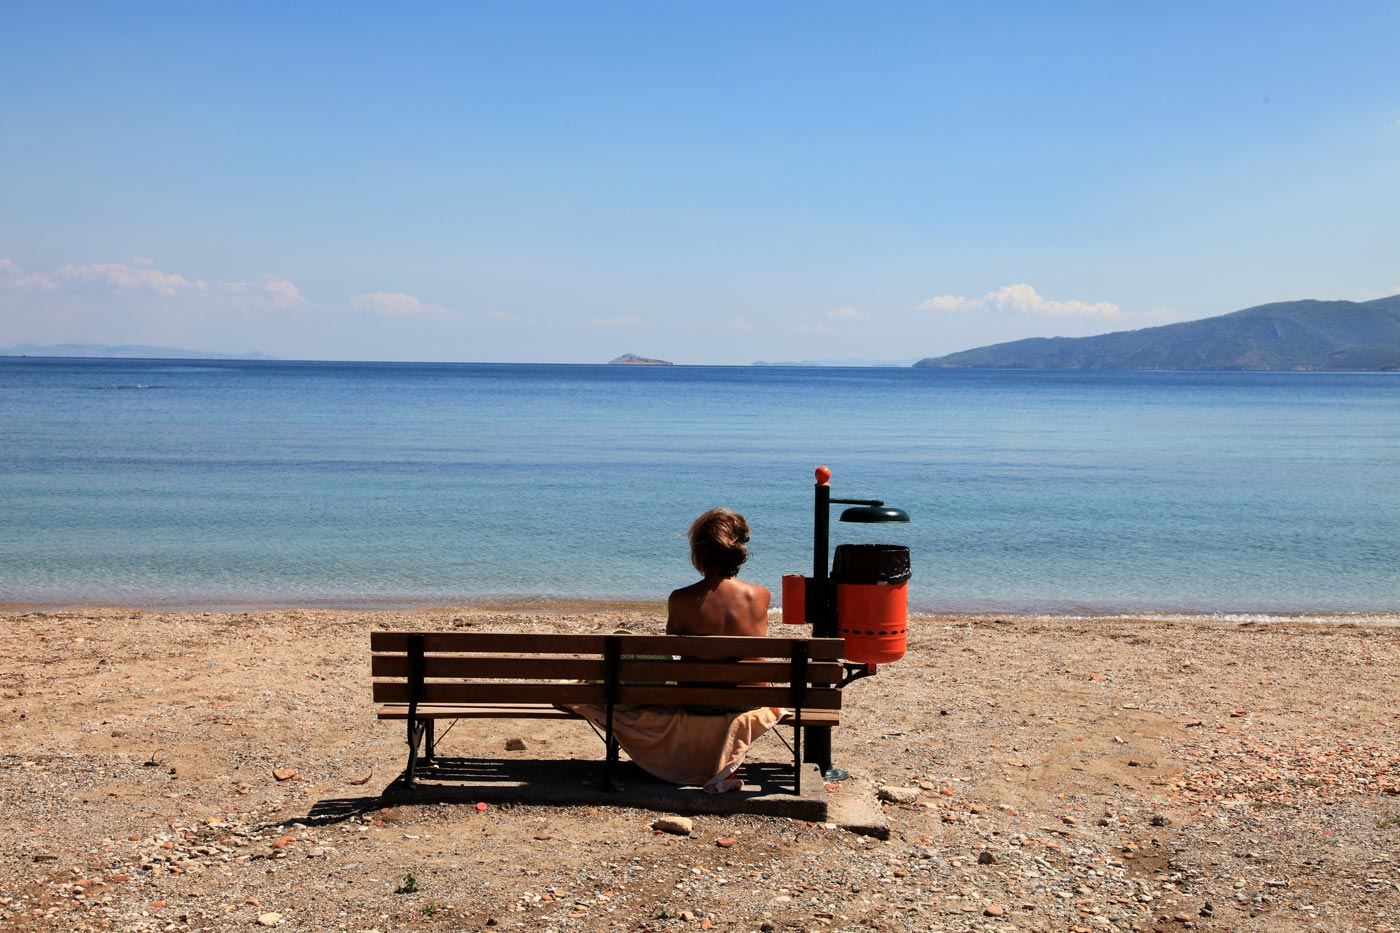 Kechriai, Greece